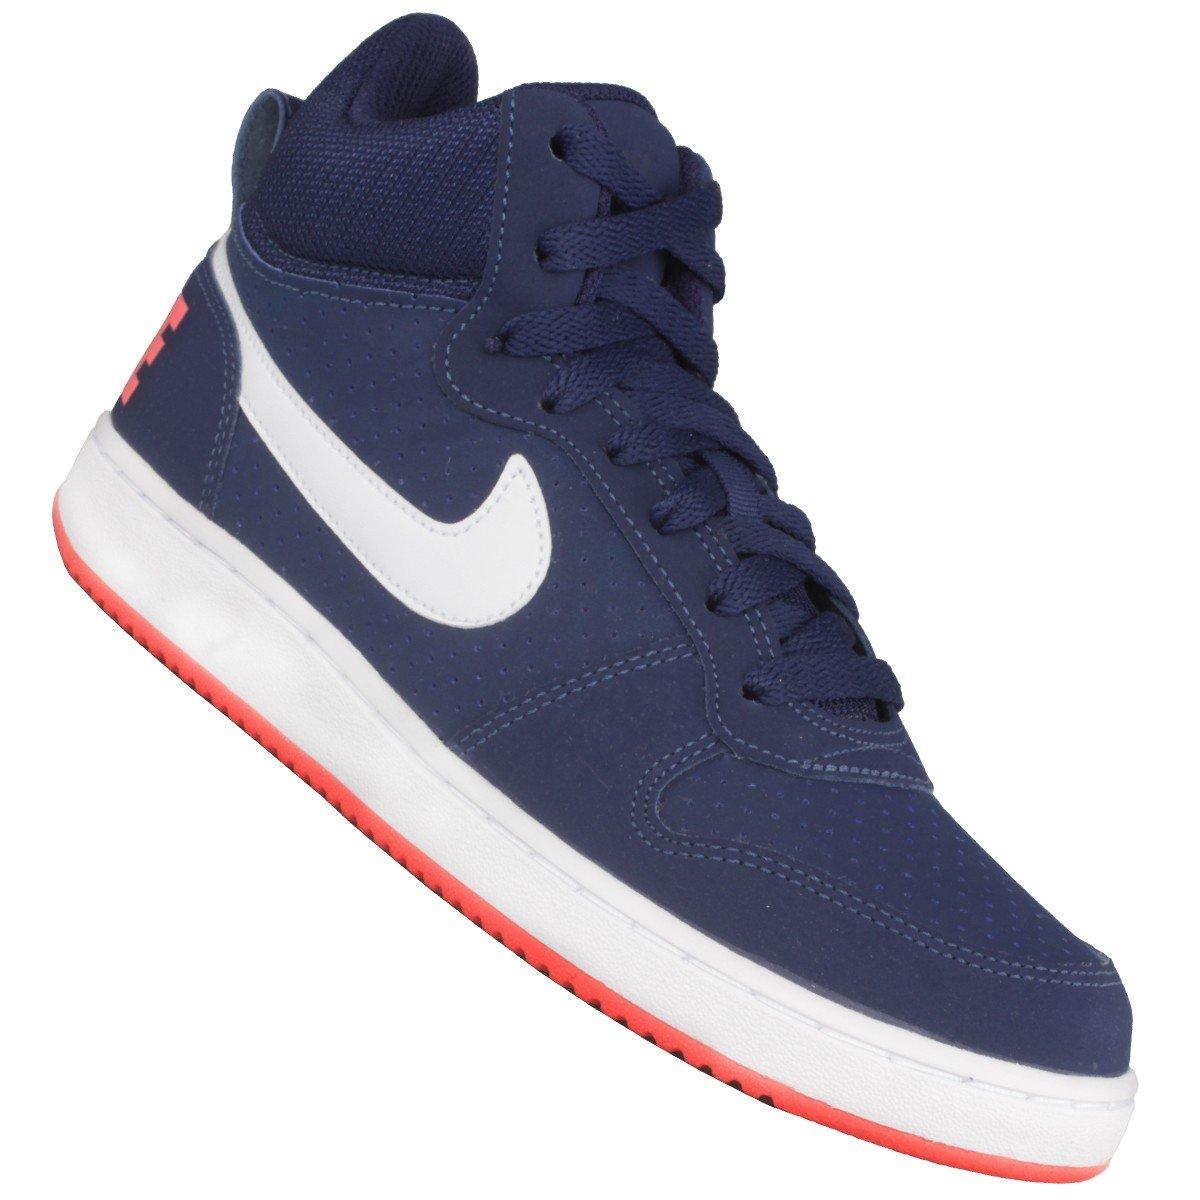 be5aa098bb4 Tênis Nike Court Borough Mid - Compre Agora